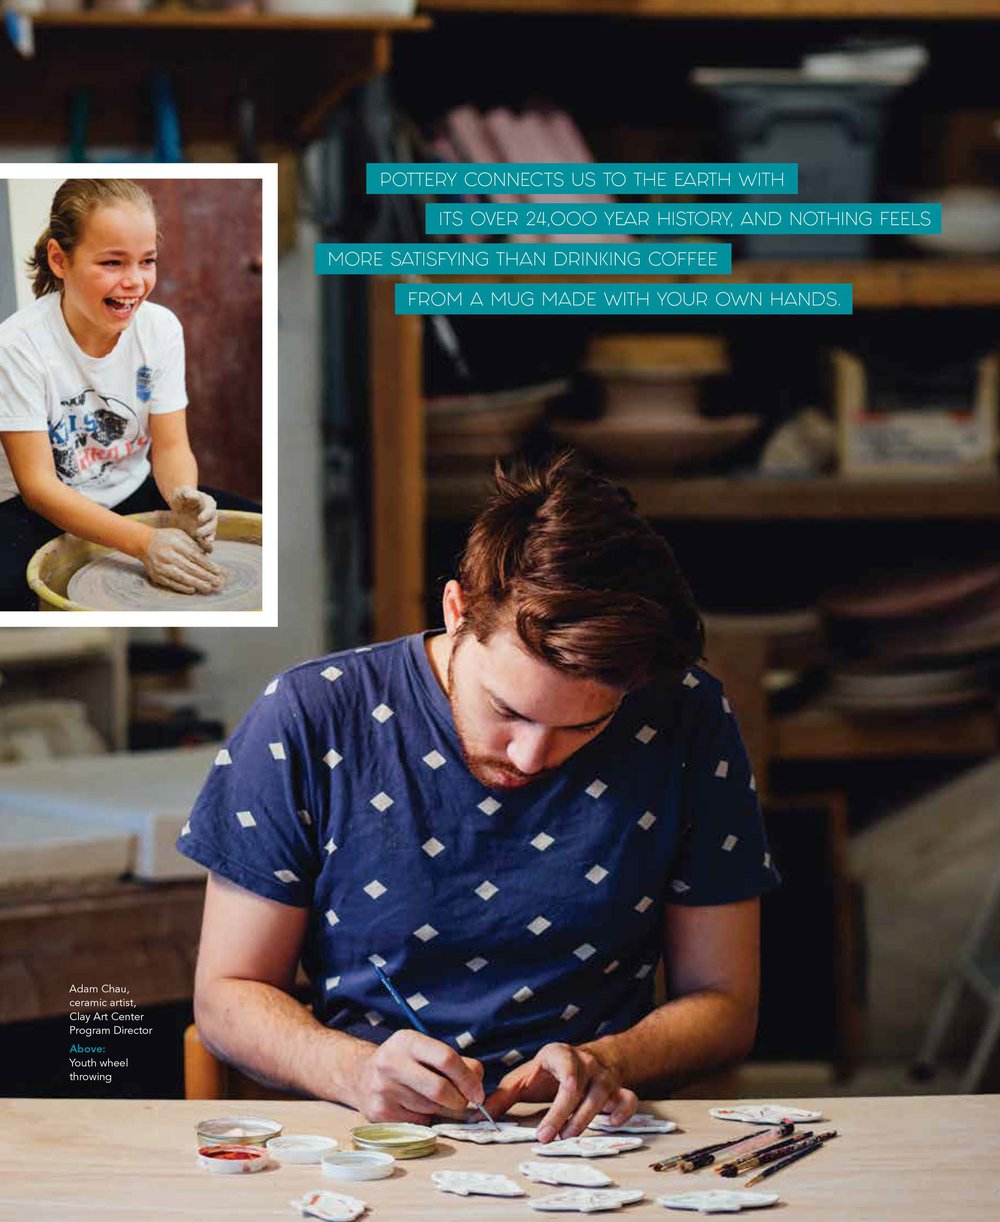 Clay Art Center Venu Magazine Feature Fall 2017-page 3.jpg